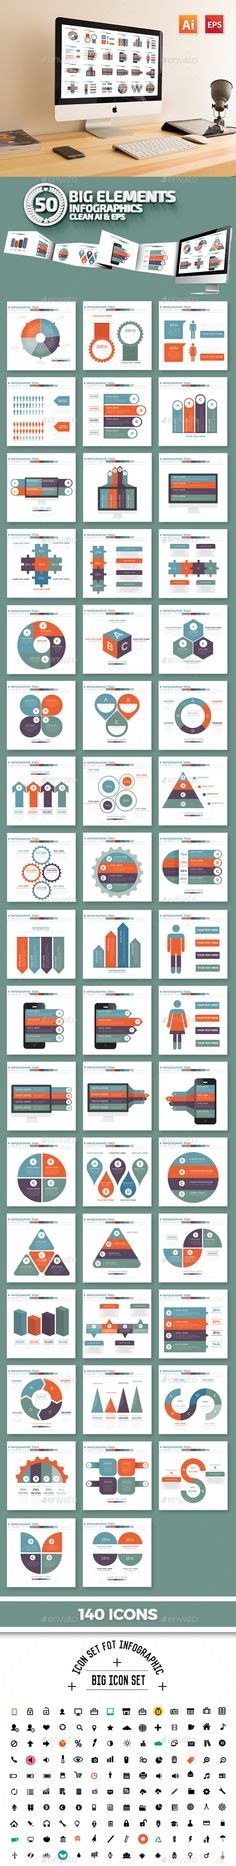 50 Infographics Design Templates Vector EPS, AI Illustrator